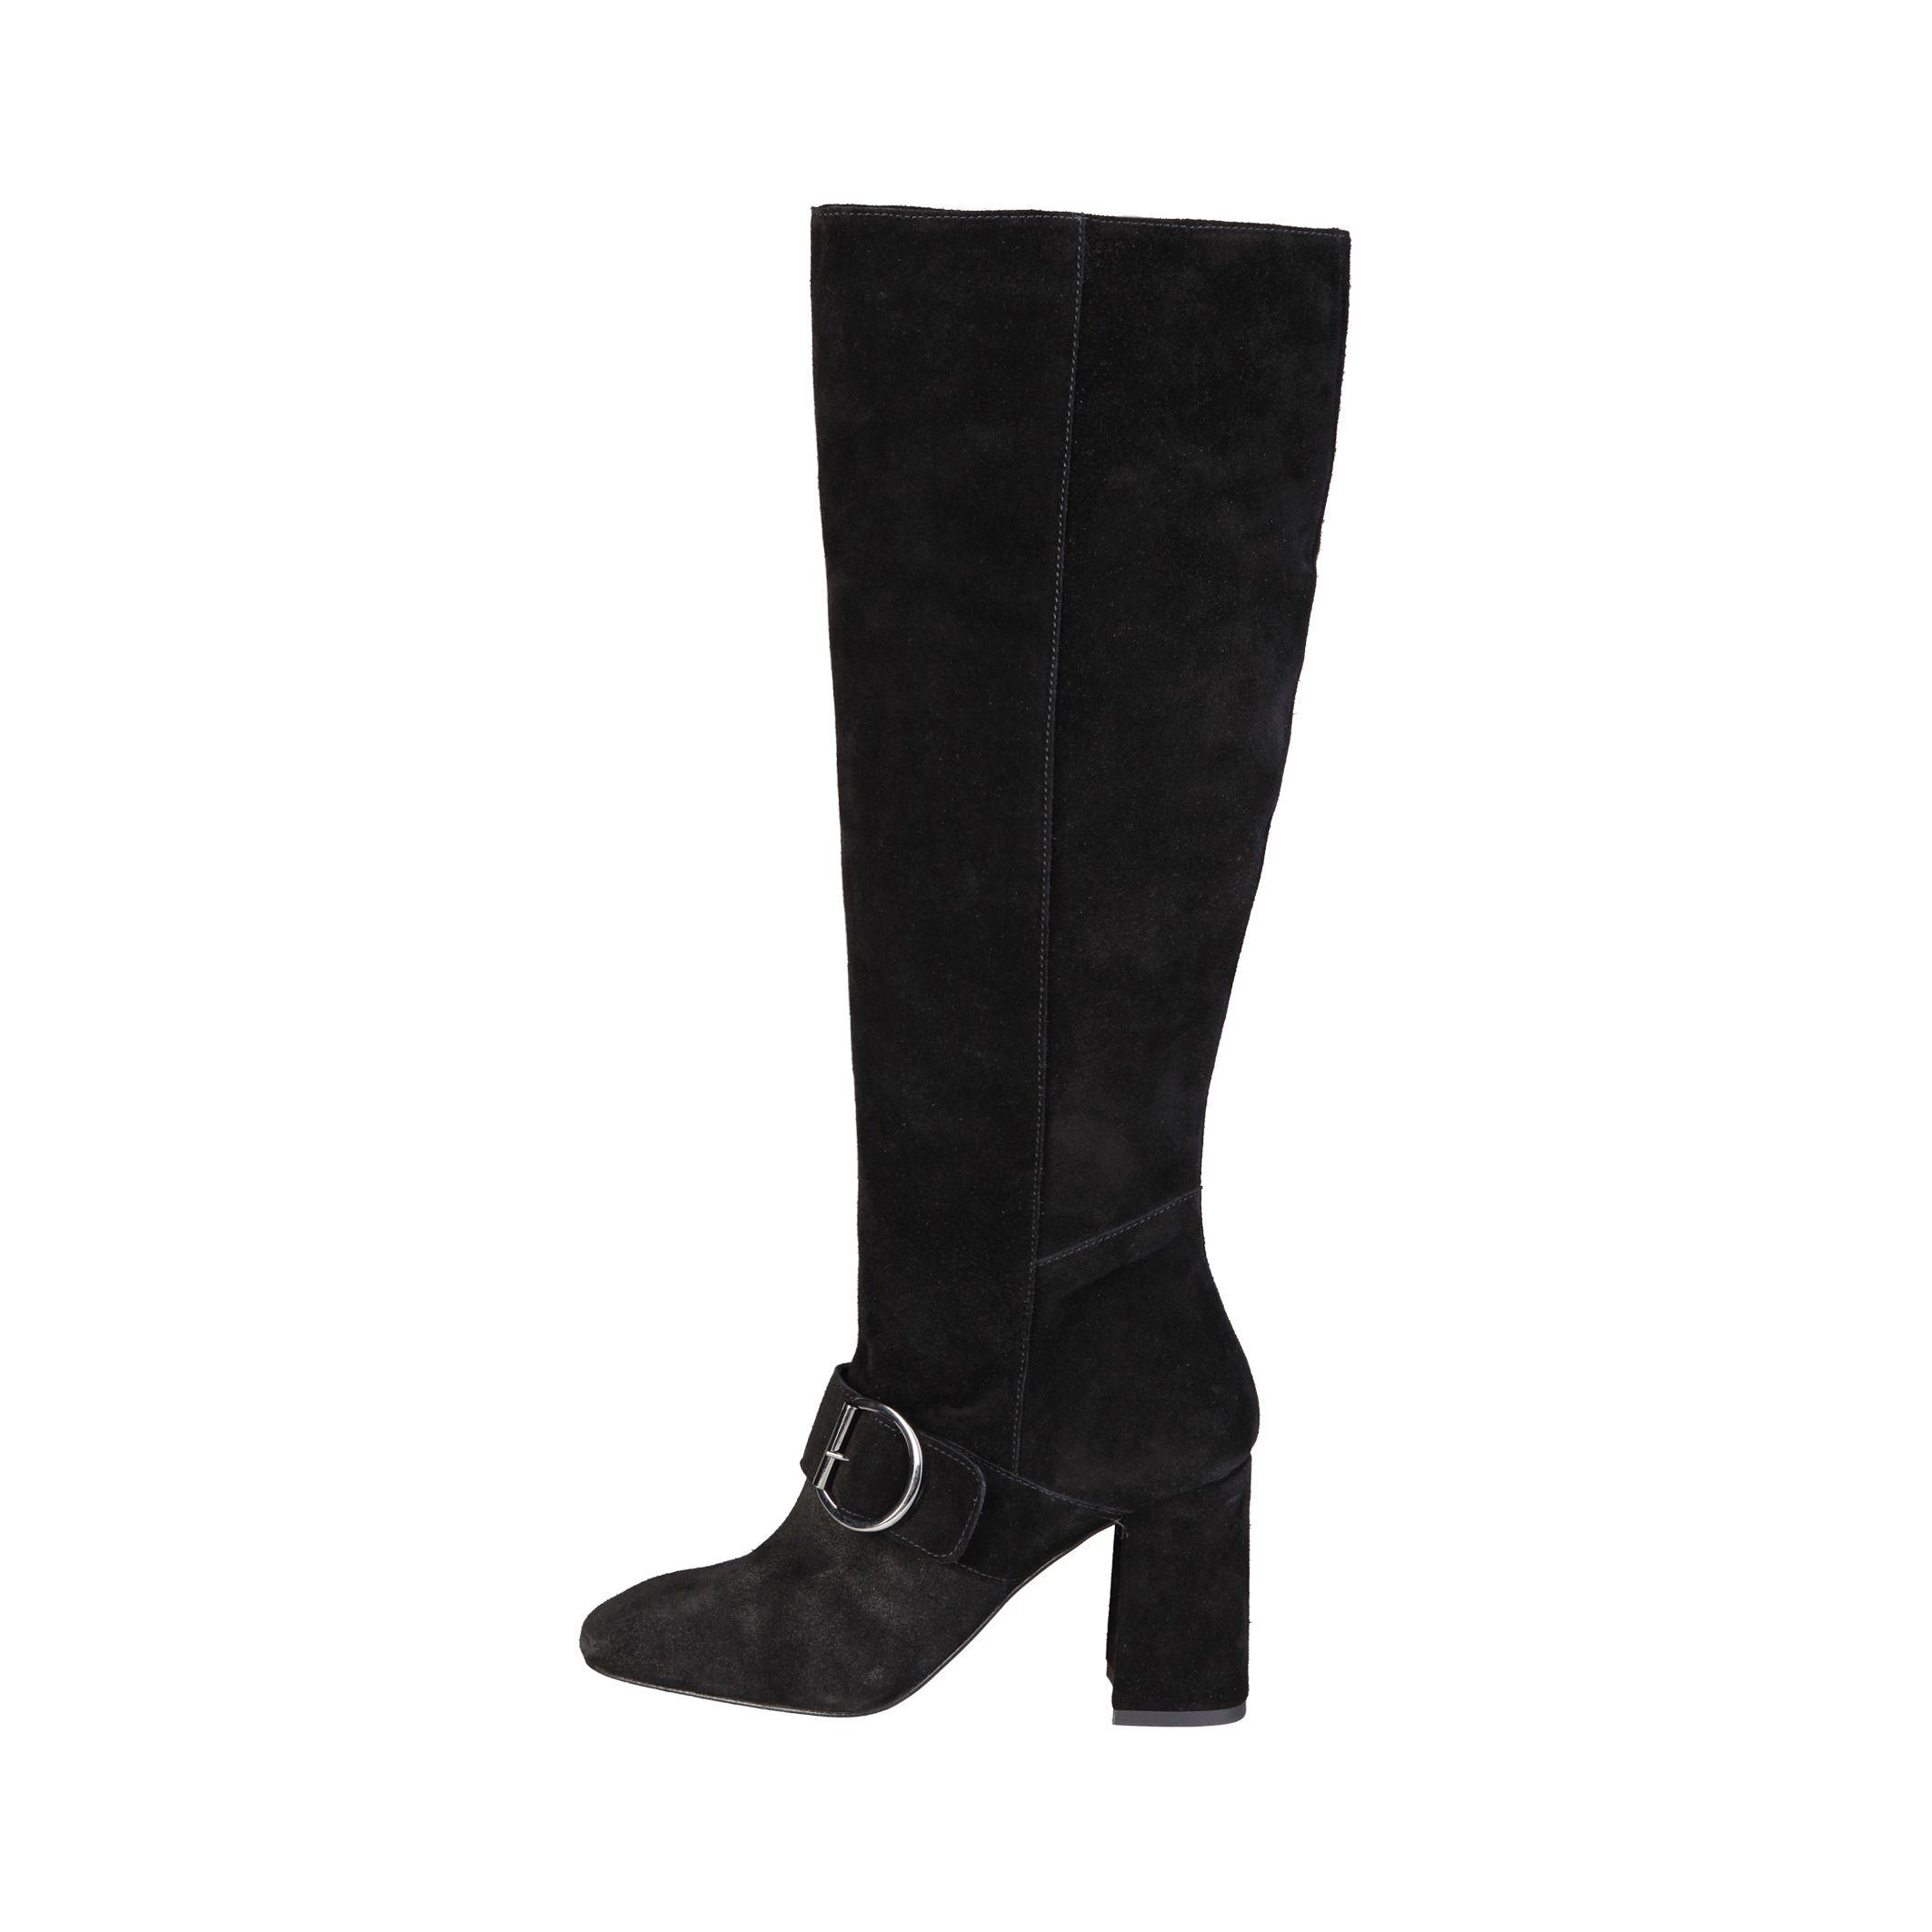 Fontana 2.0 Womens Boots